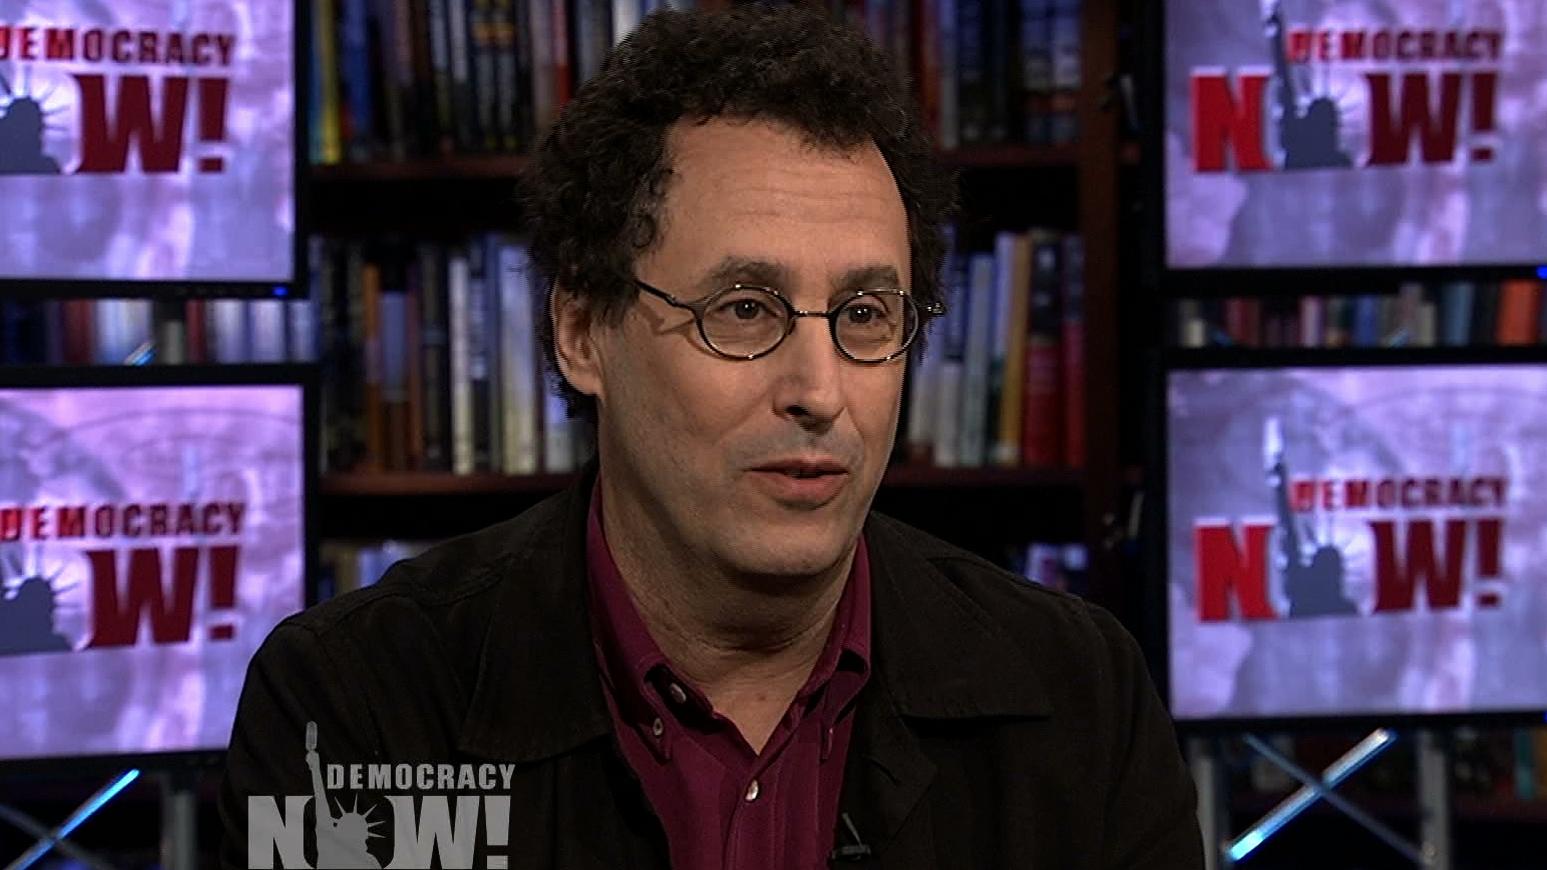 Playwright Tony Kushner Hails Obama's Support for Same-Sex Marriage: